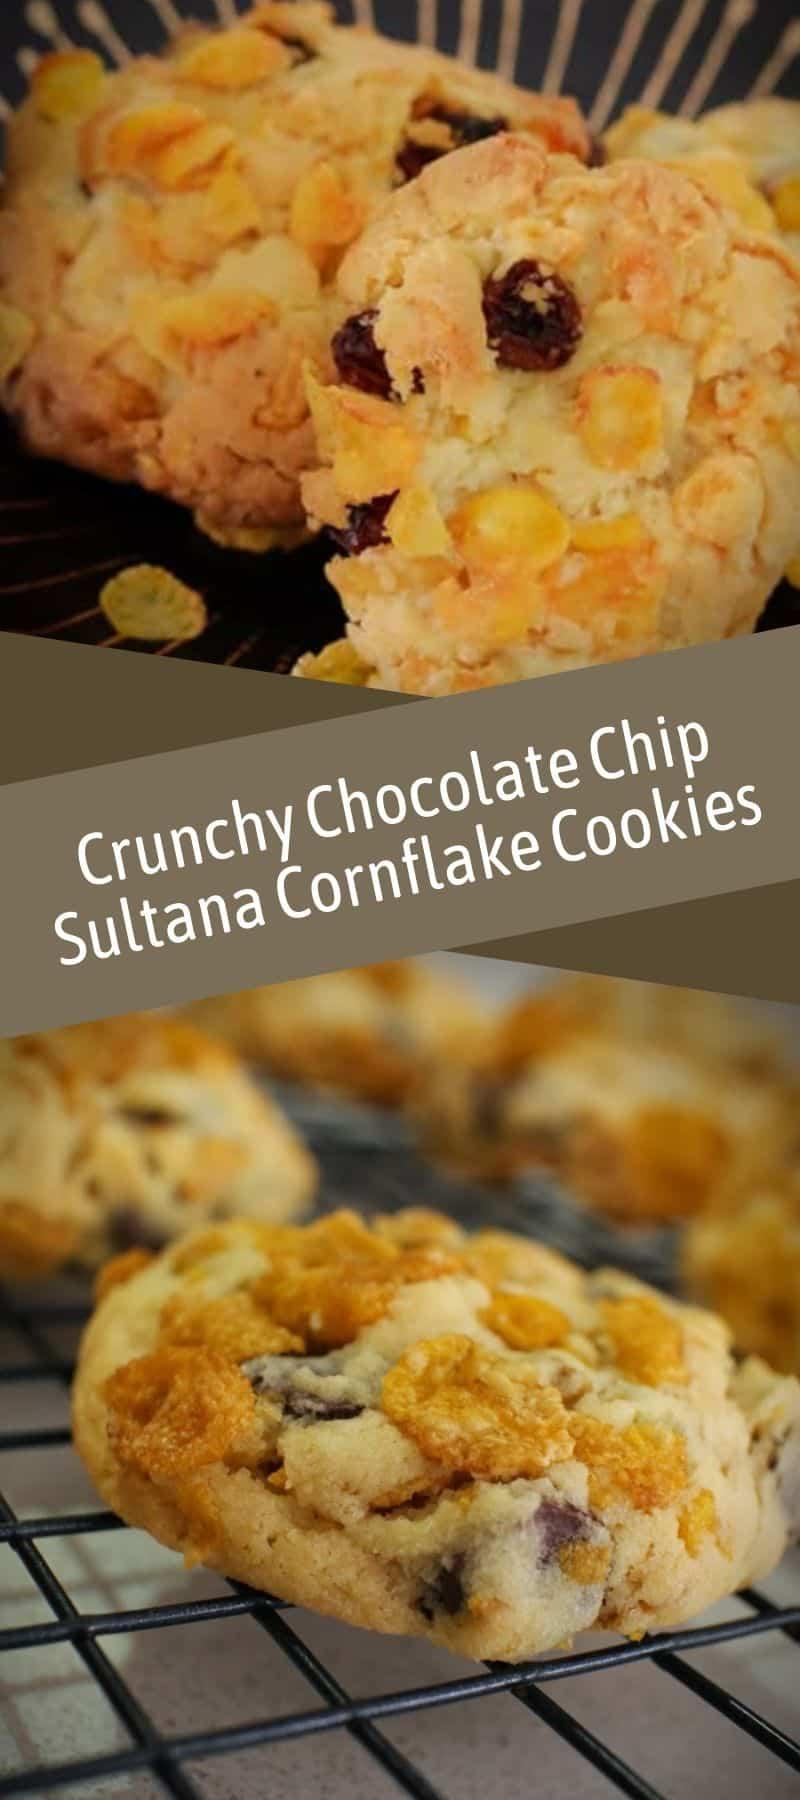 Crunchy-Chocolate-Chip-Sultana-Cornflake-Cookies-3